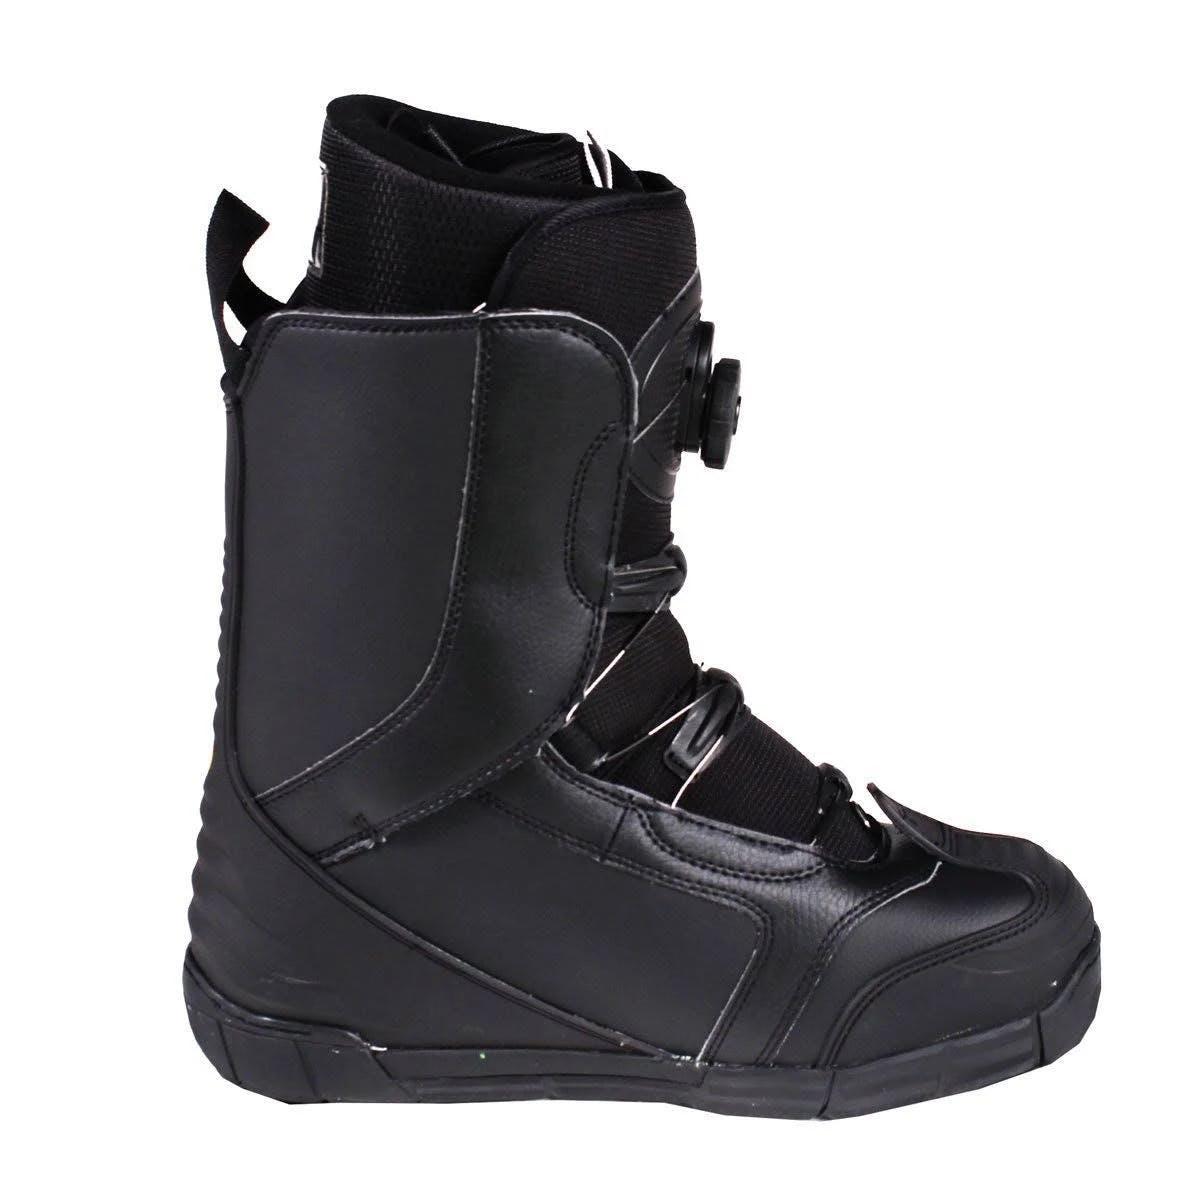 Rossignol Excite BOA H2 Rsp Snowboard Boots Black 7